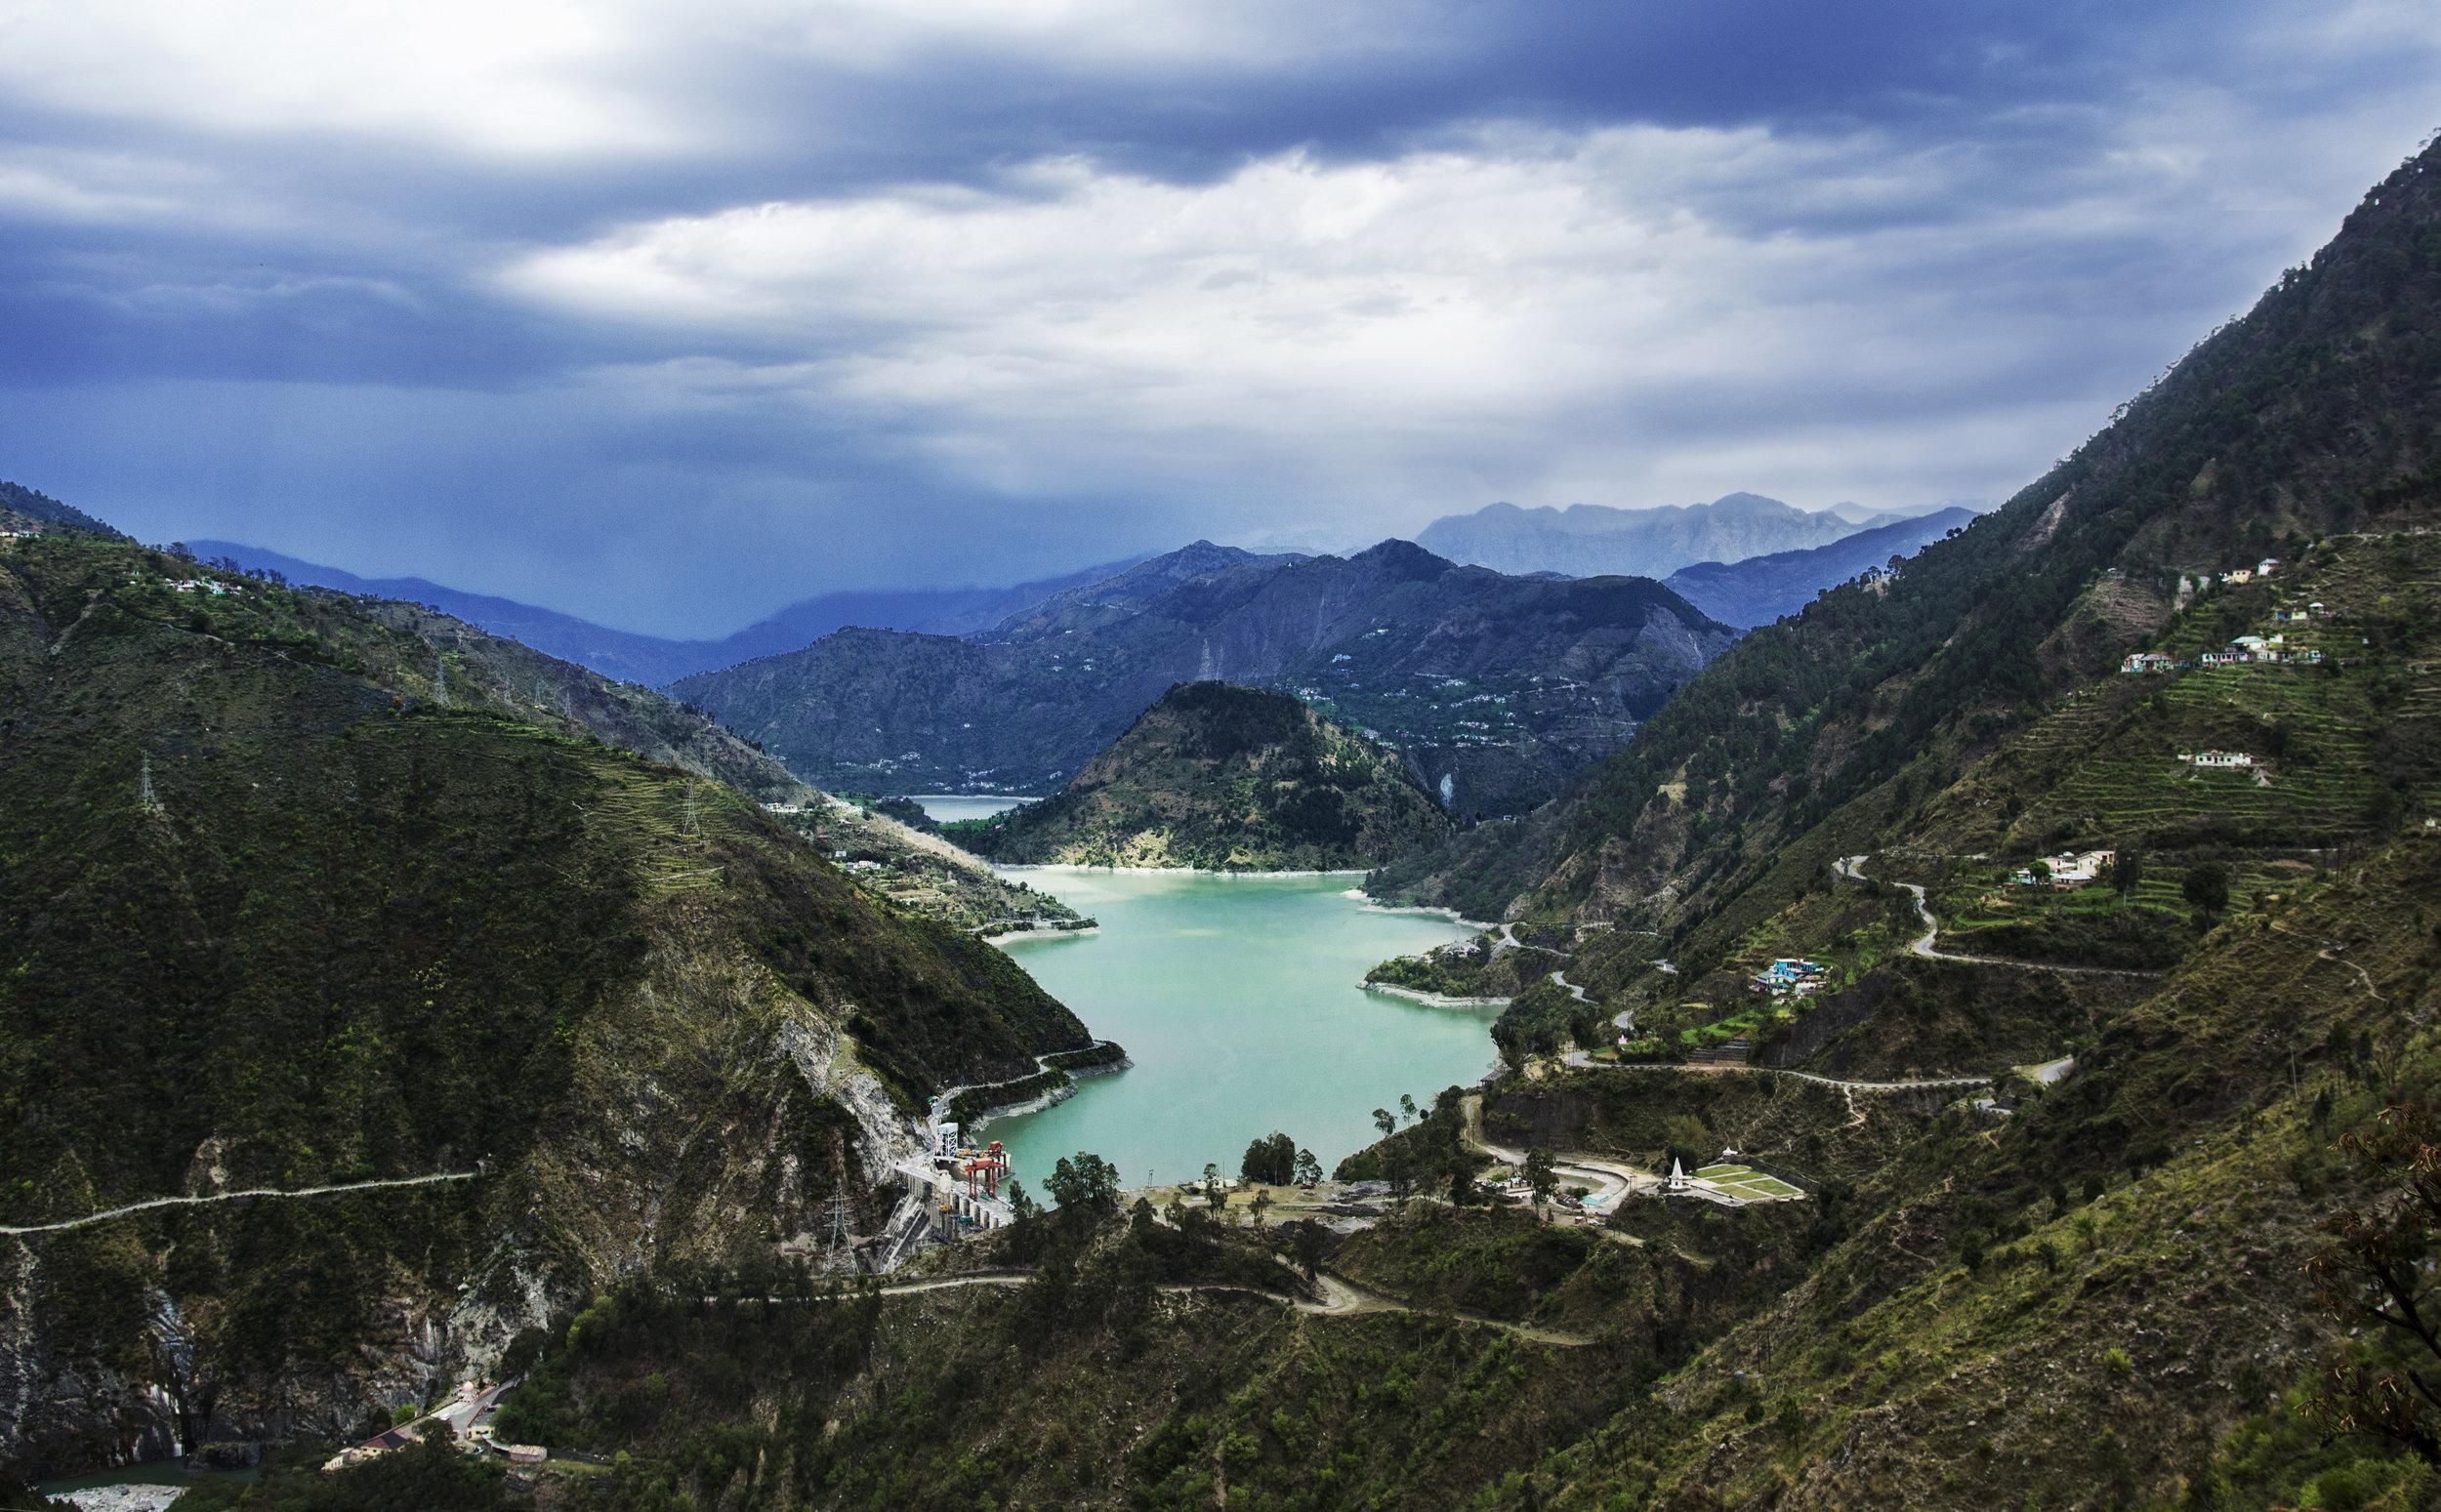 chamera reservoir himachal pradesh india